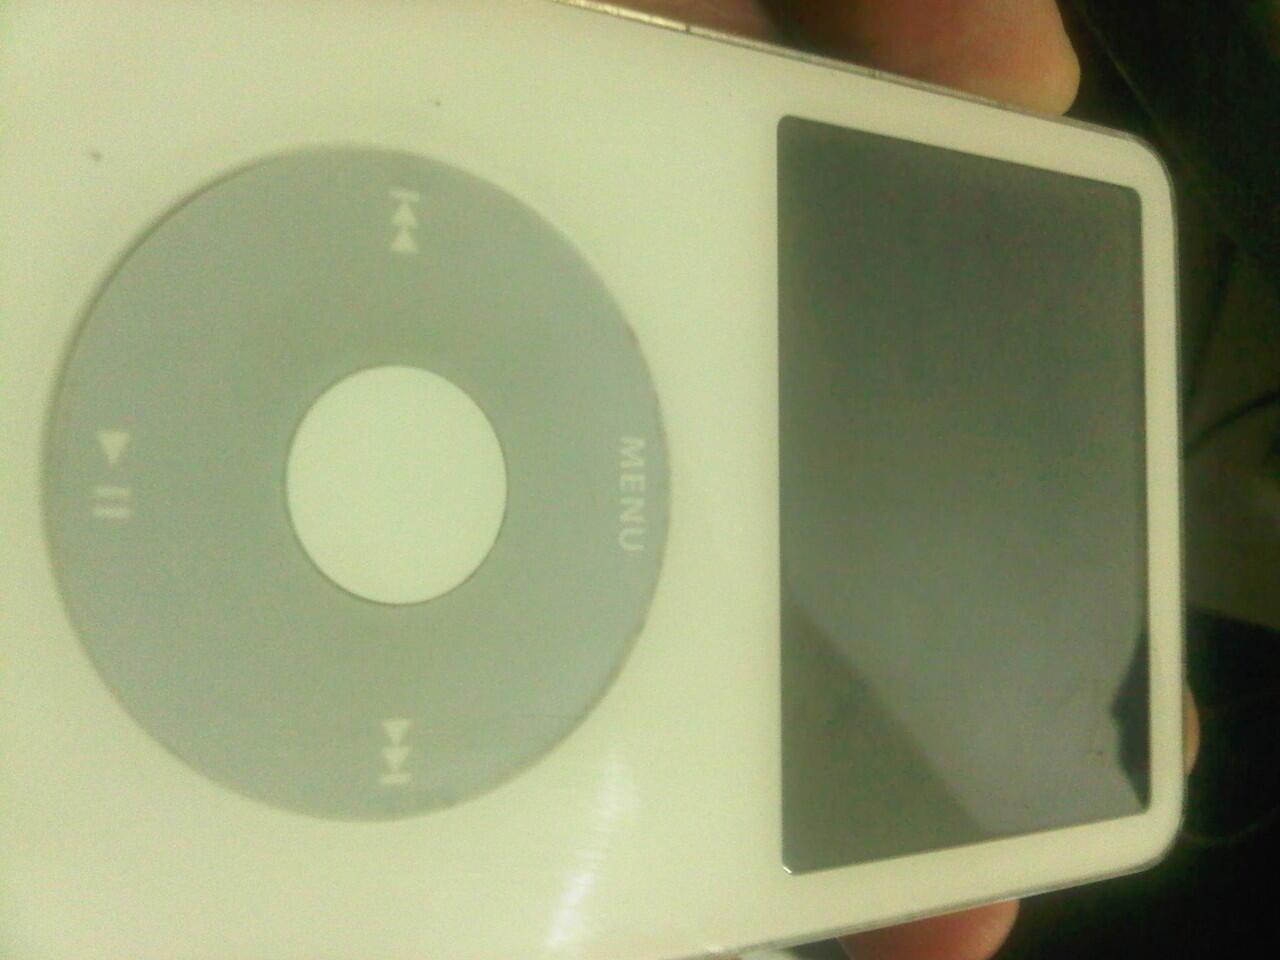 WTS JUAL IPOD GLASSIC 8GB